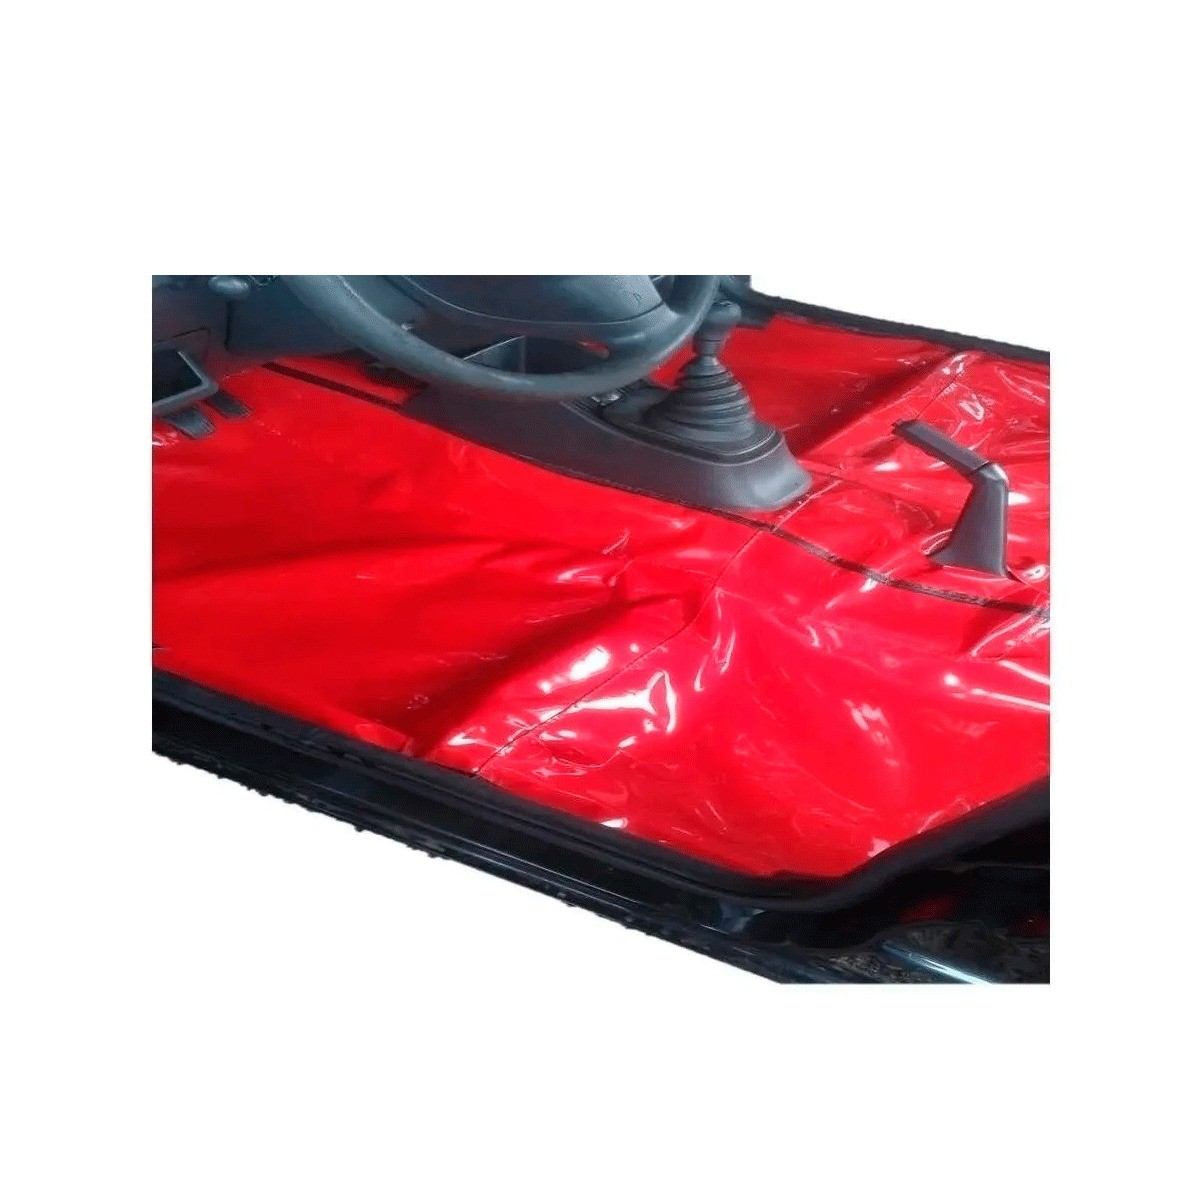 Capa Vinil Proteção Carpete Tapete Ford Cargo 2011 2012 2013 Vermelho